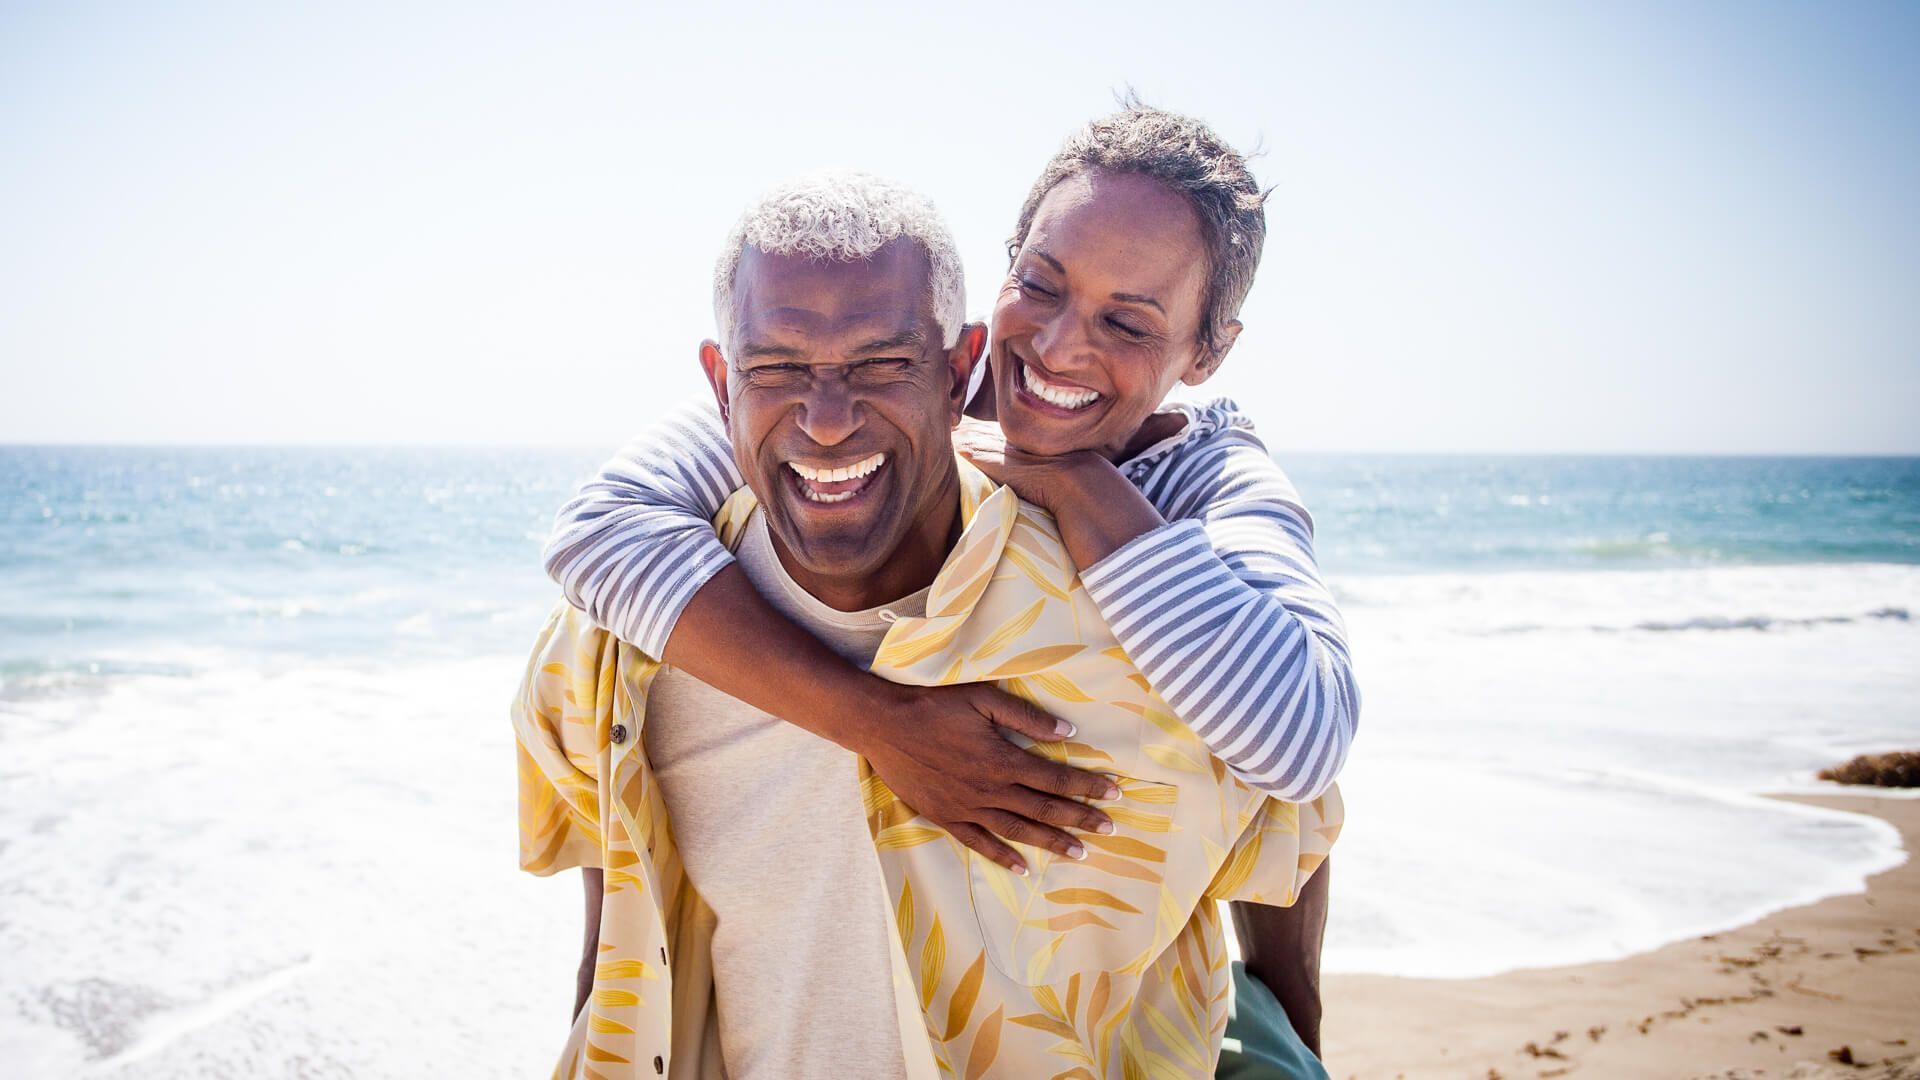 A beautiful senior black couple piggyback on the beach.